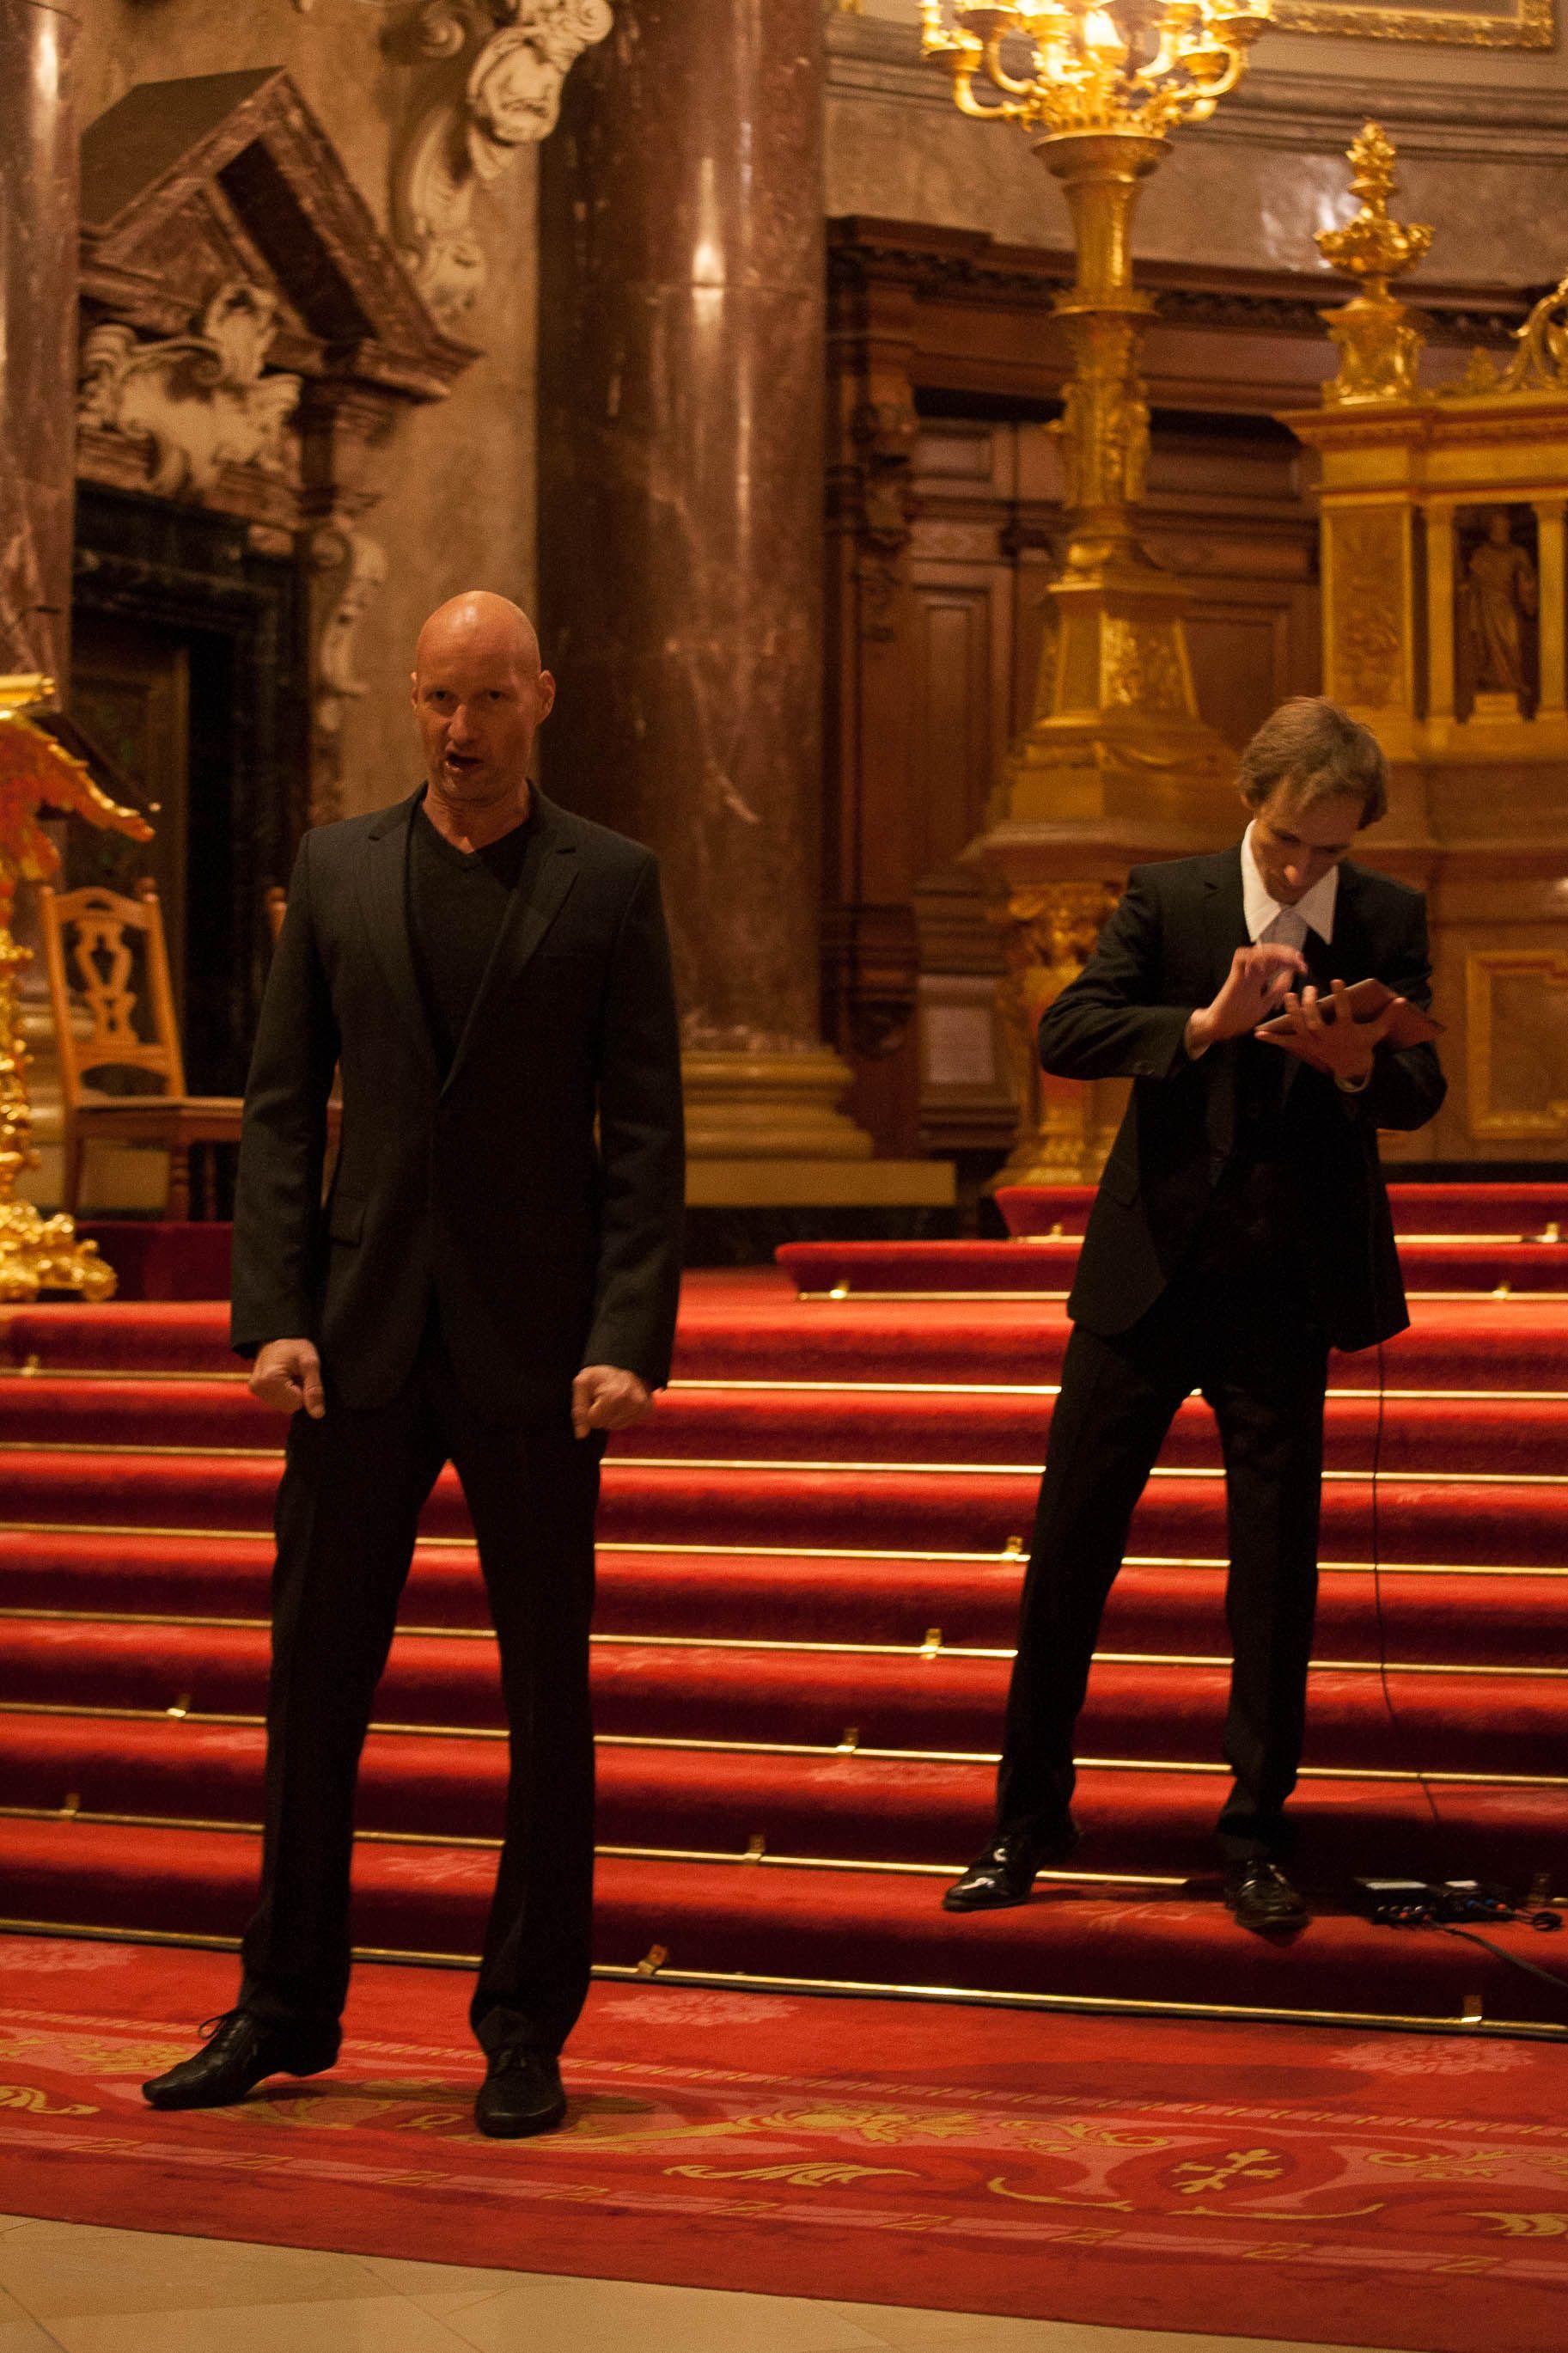 "photo: Johannes Püschel | concert @berlinerdom 16.12.2012 | playing aria ""Großer Herr"" (Bach) on mobile devices featuring Roman Trekel"